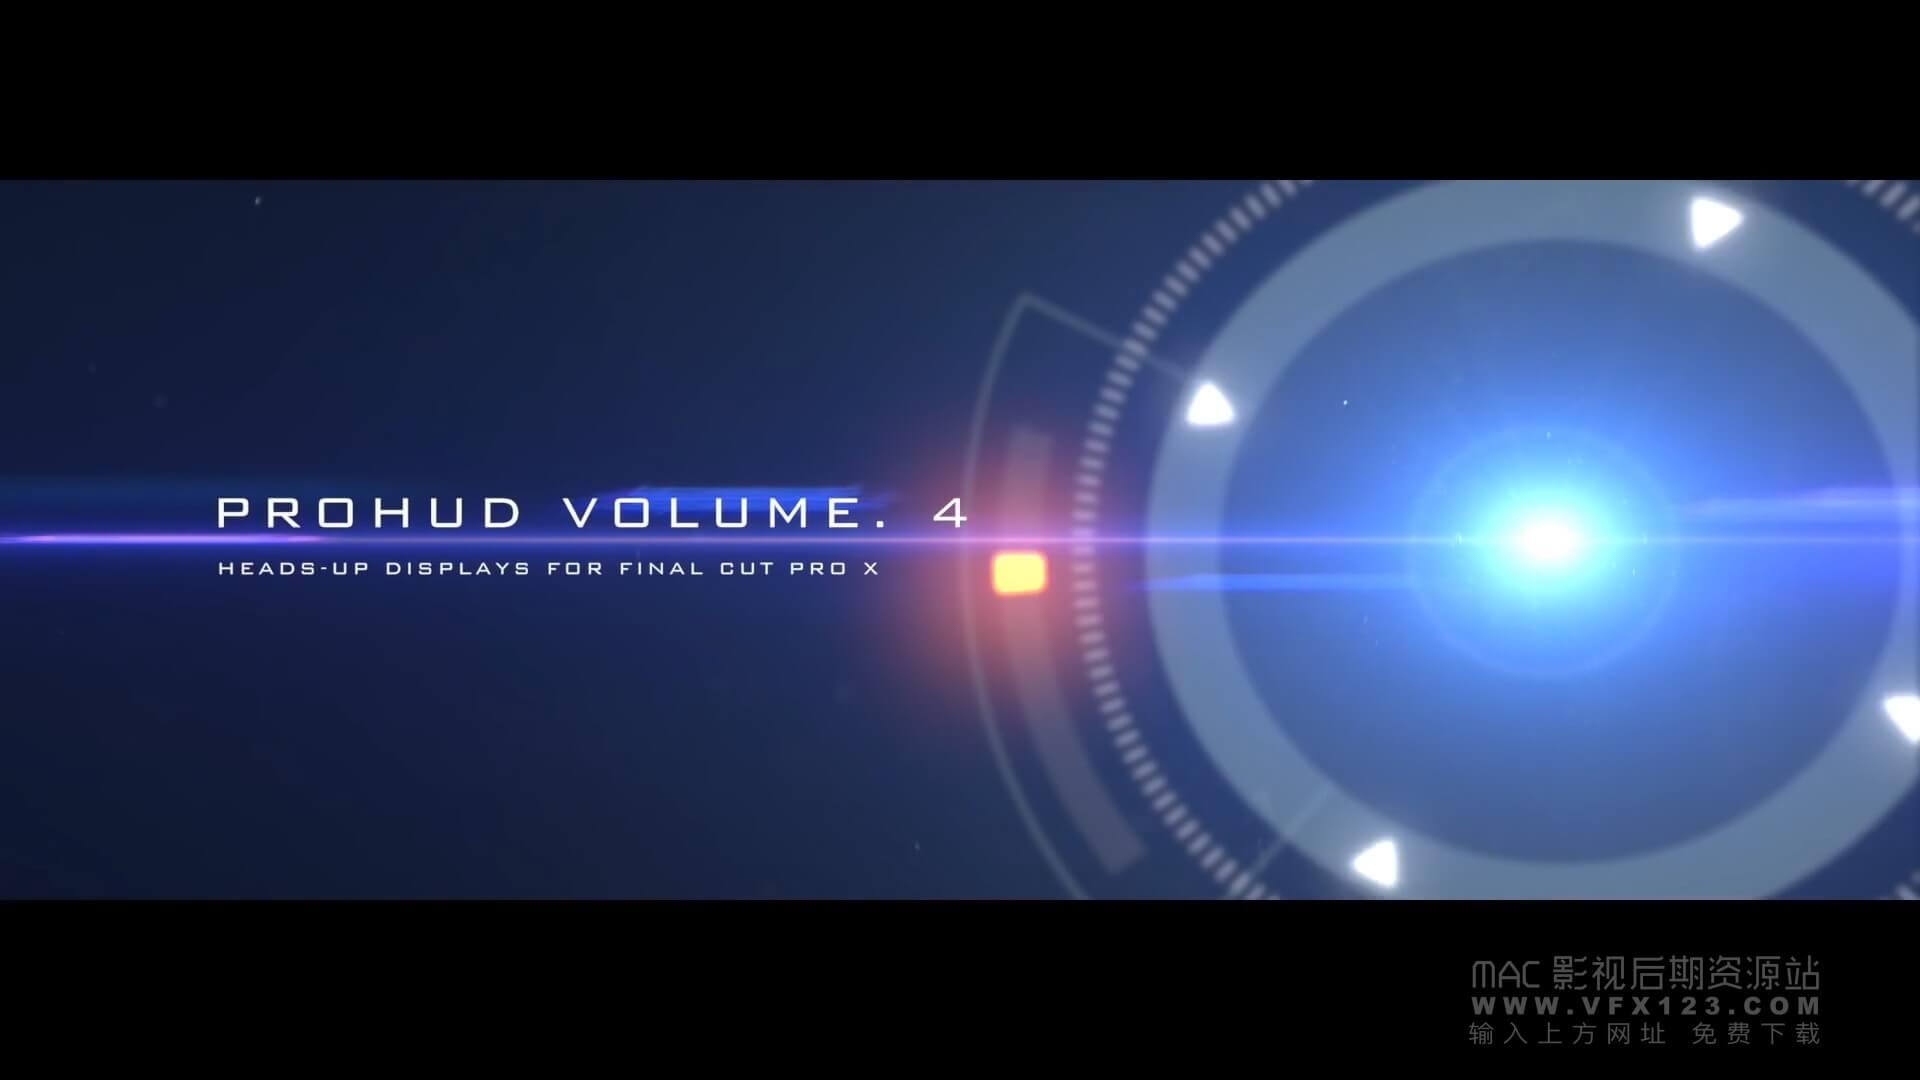 fcpx发生器 30组高科技信息化触控界面元素 ProHUD v4